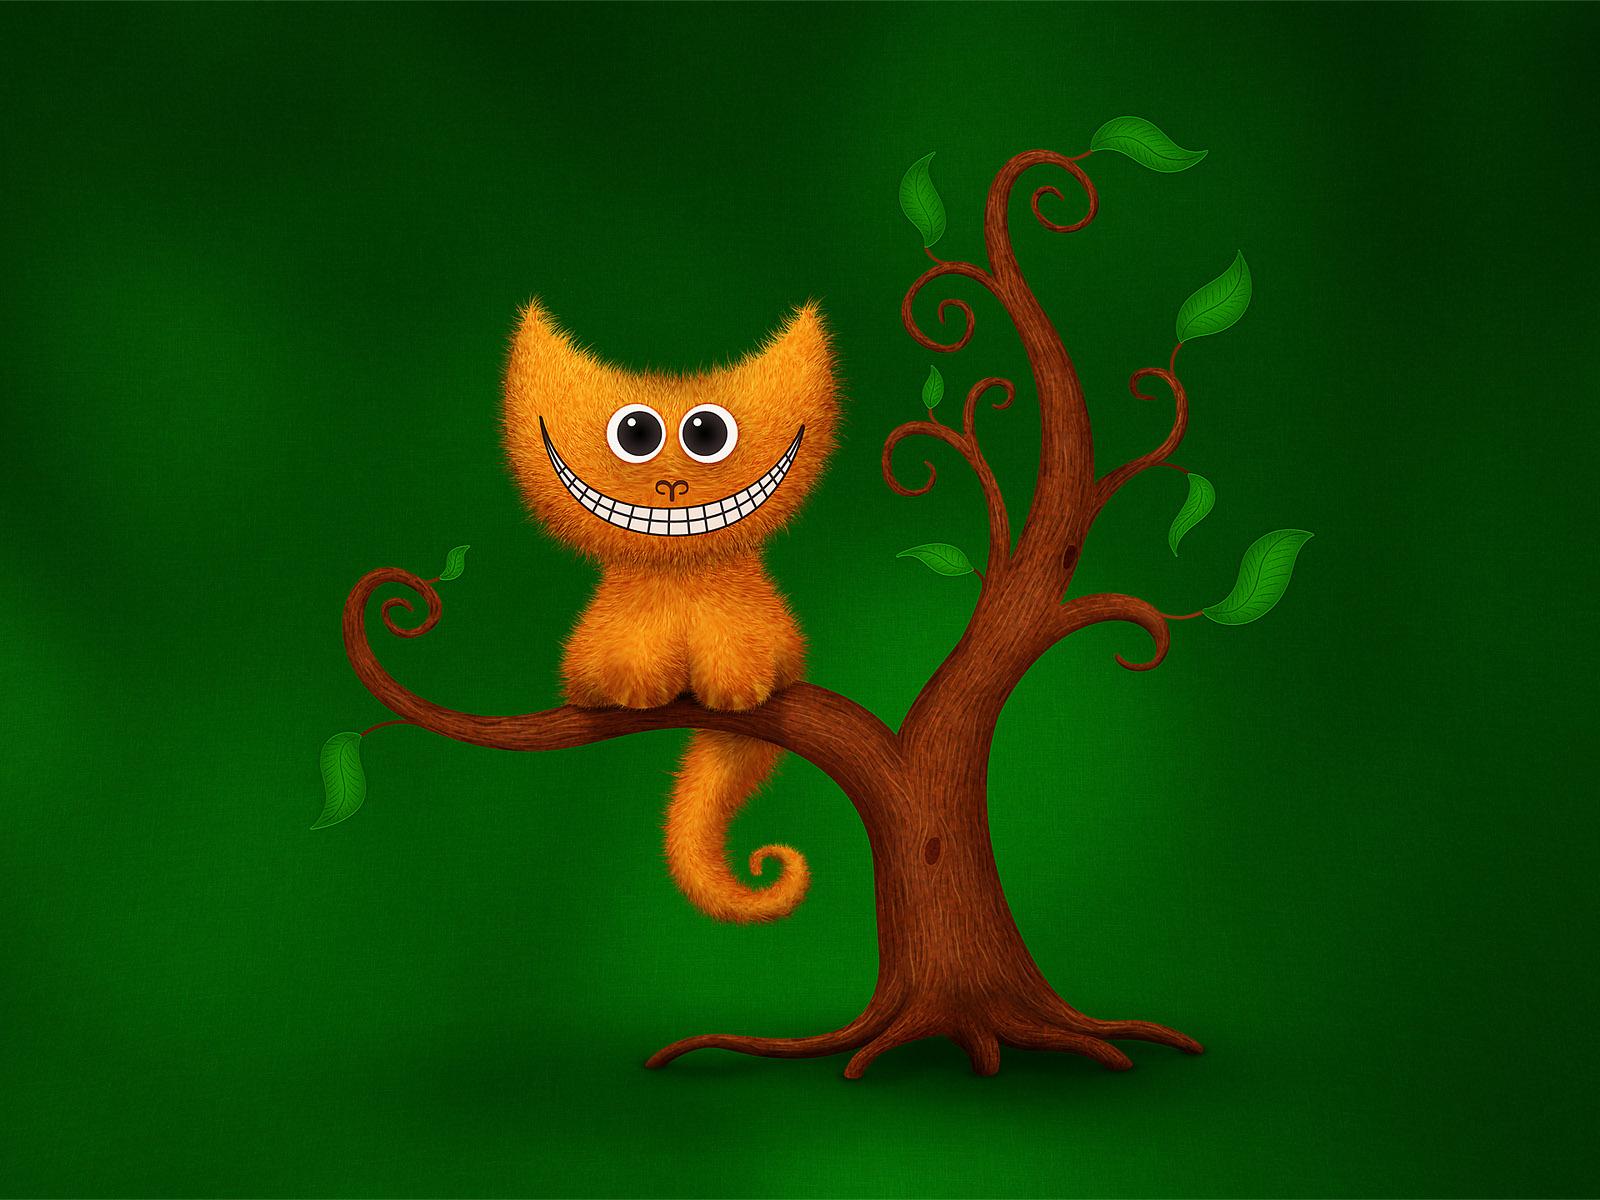 Funny Cartoon Cat 14 Hd Wallpaper Funnypictureorg